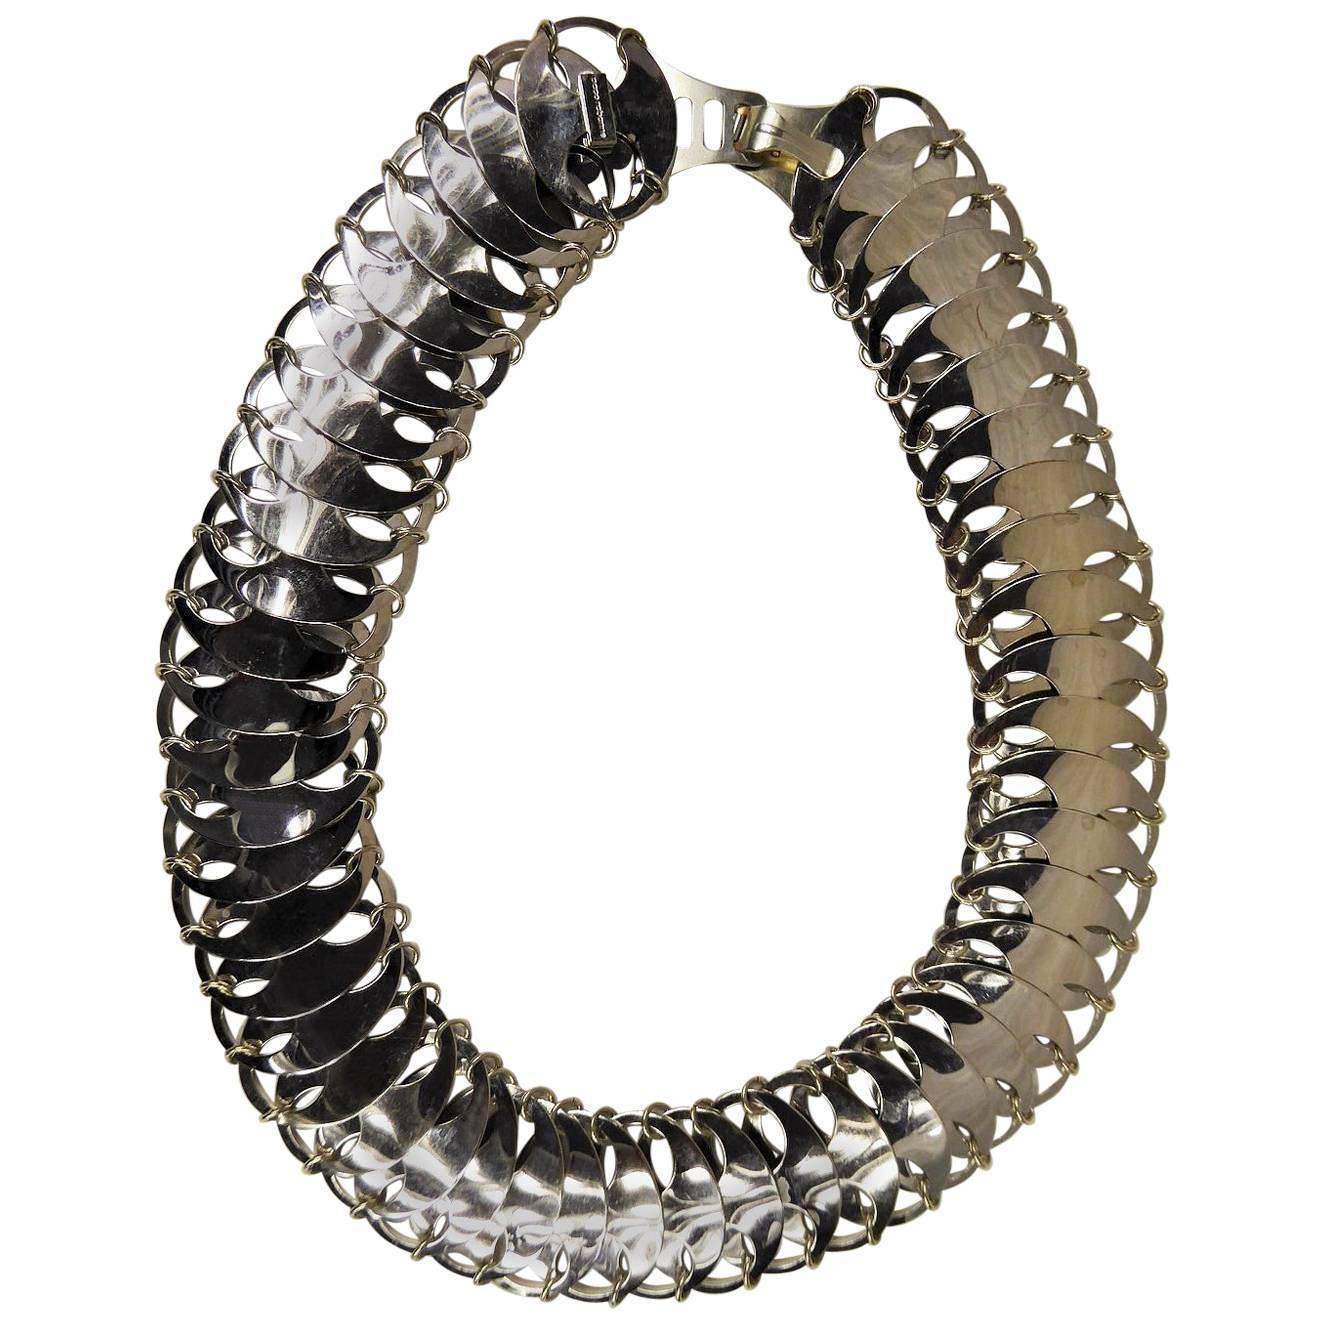 Paco Rabanne Metallic Belt